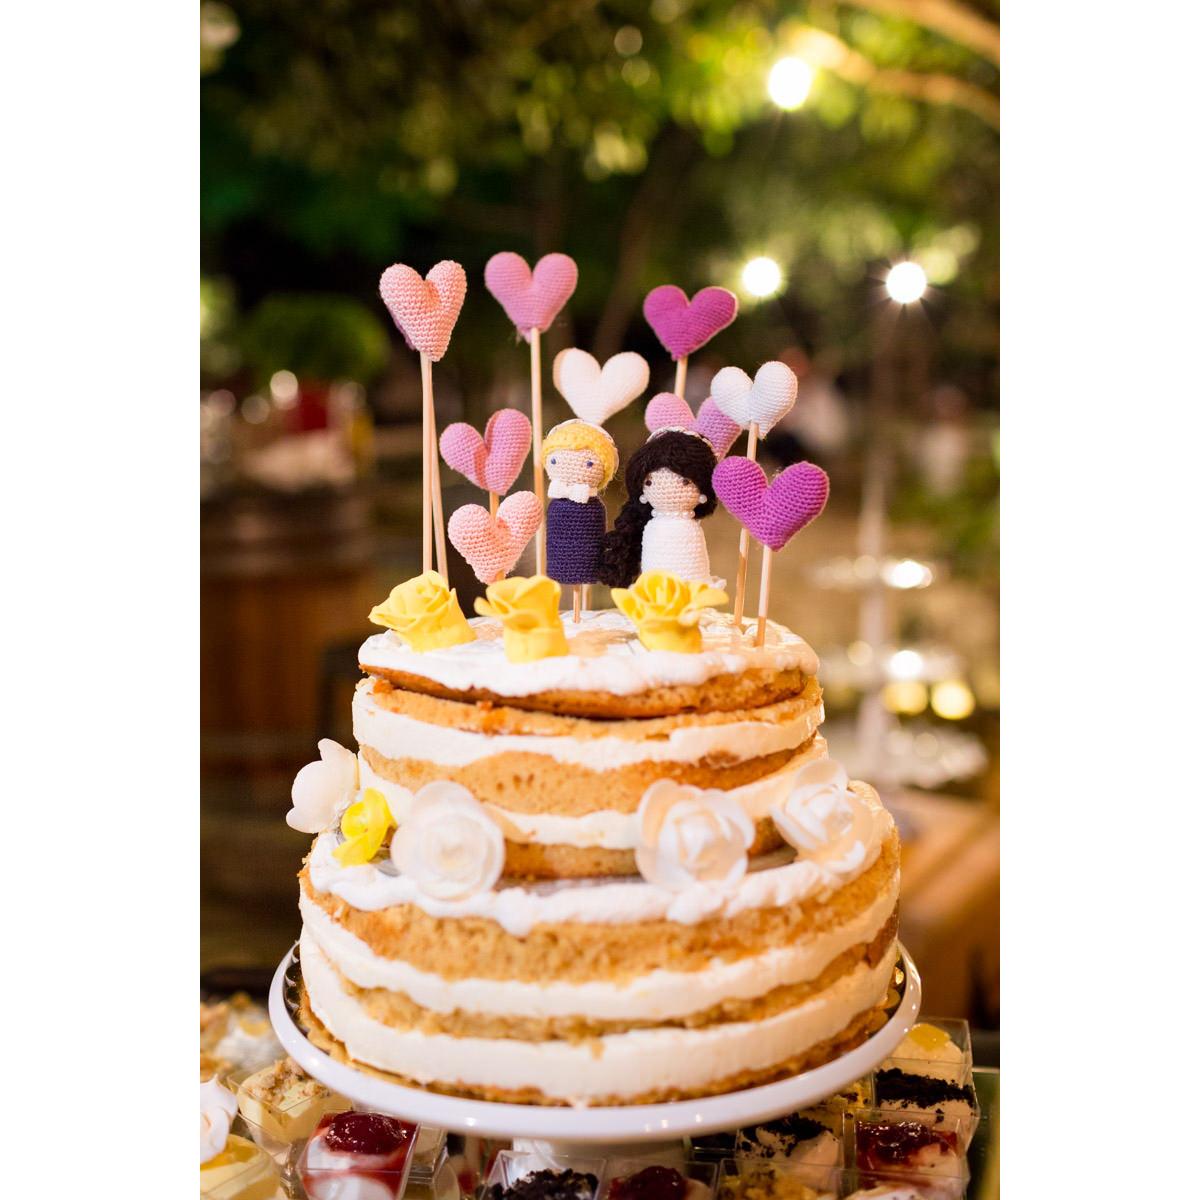 wedding cake in Greece